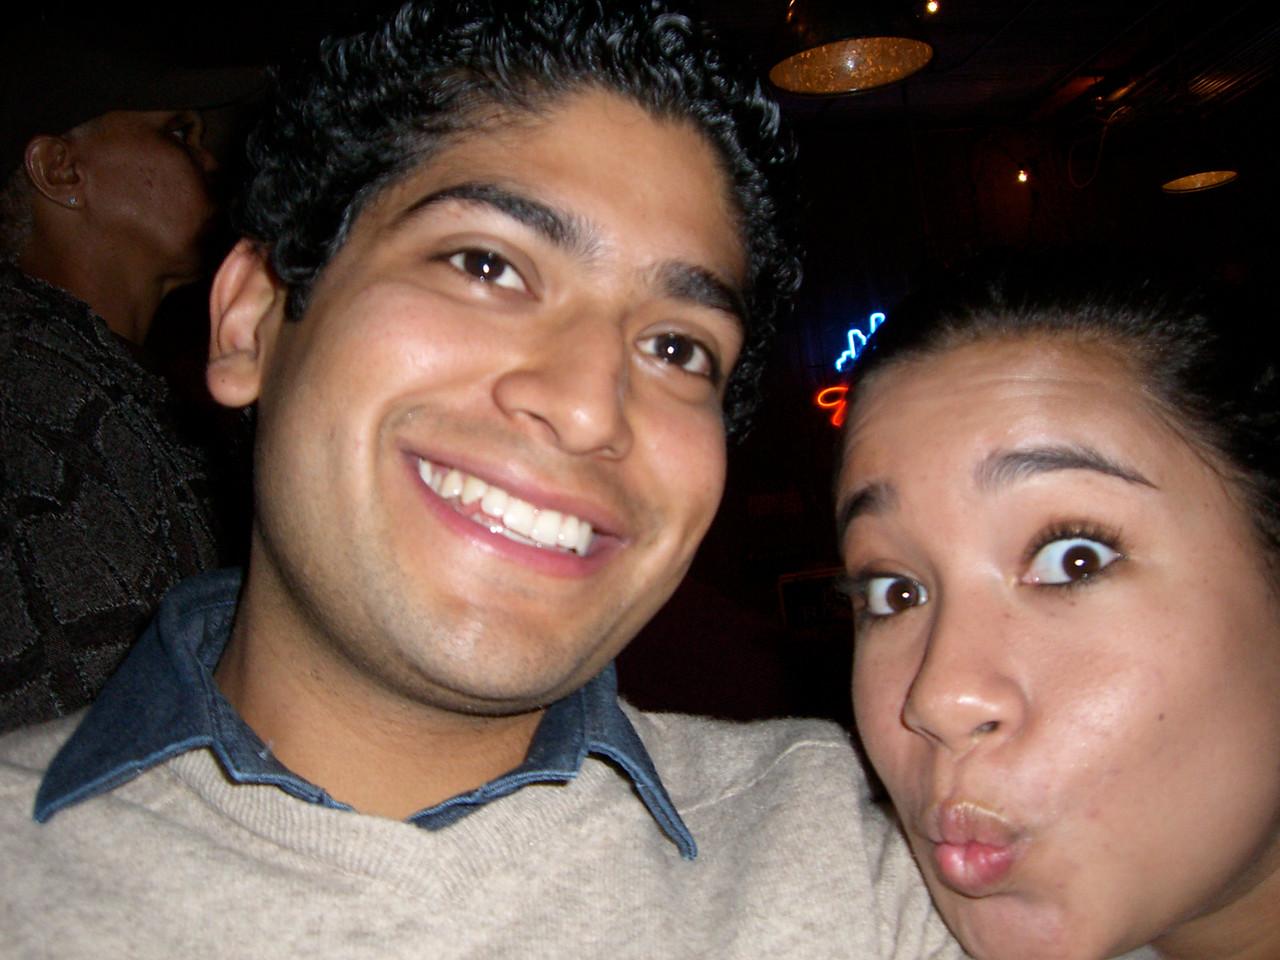 2005 11 18 Fri - Pablo Pozo & Jennifer Evans 2